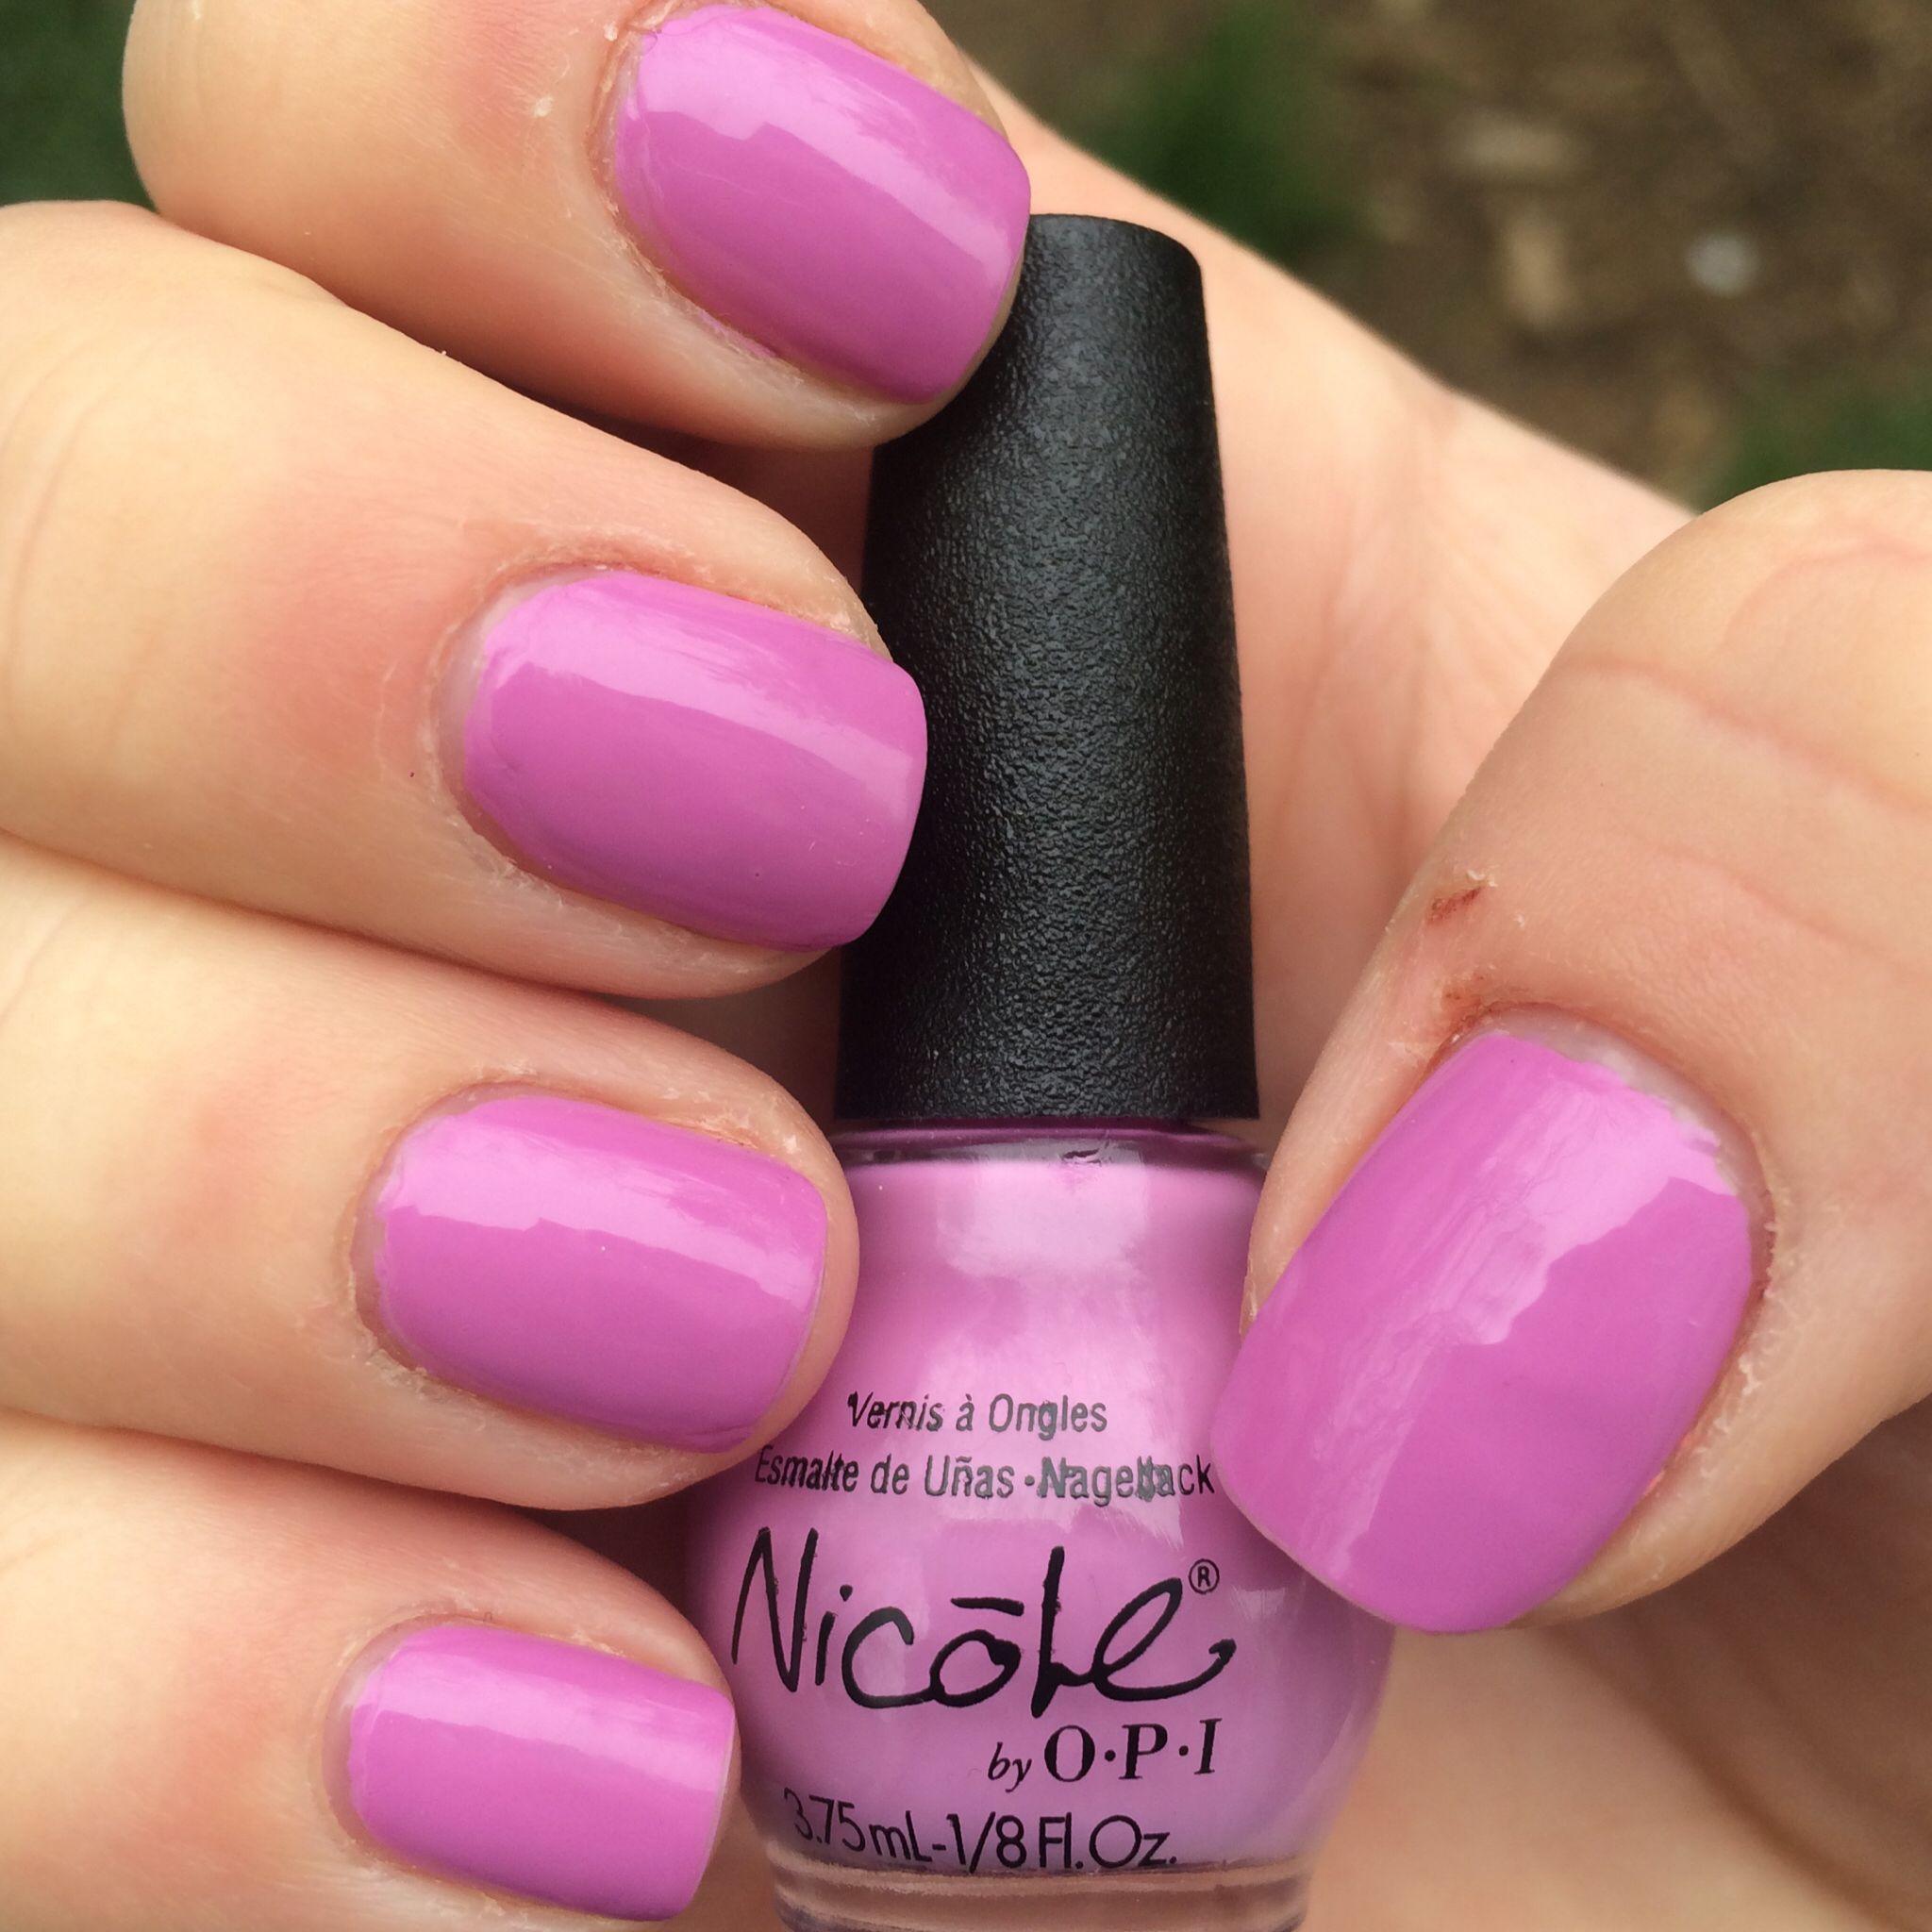 98. Nicole by OPI: Get A Mauve On #Nails #NailSwatch #NicolebyOPI ...